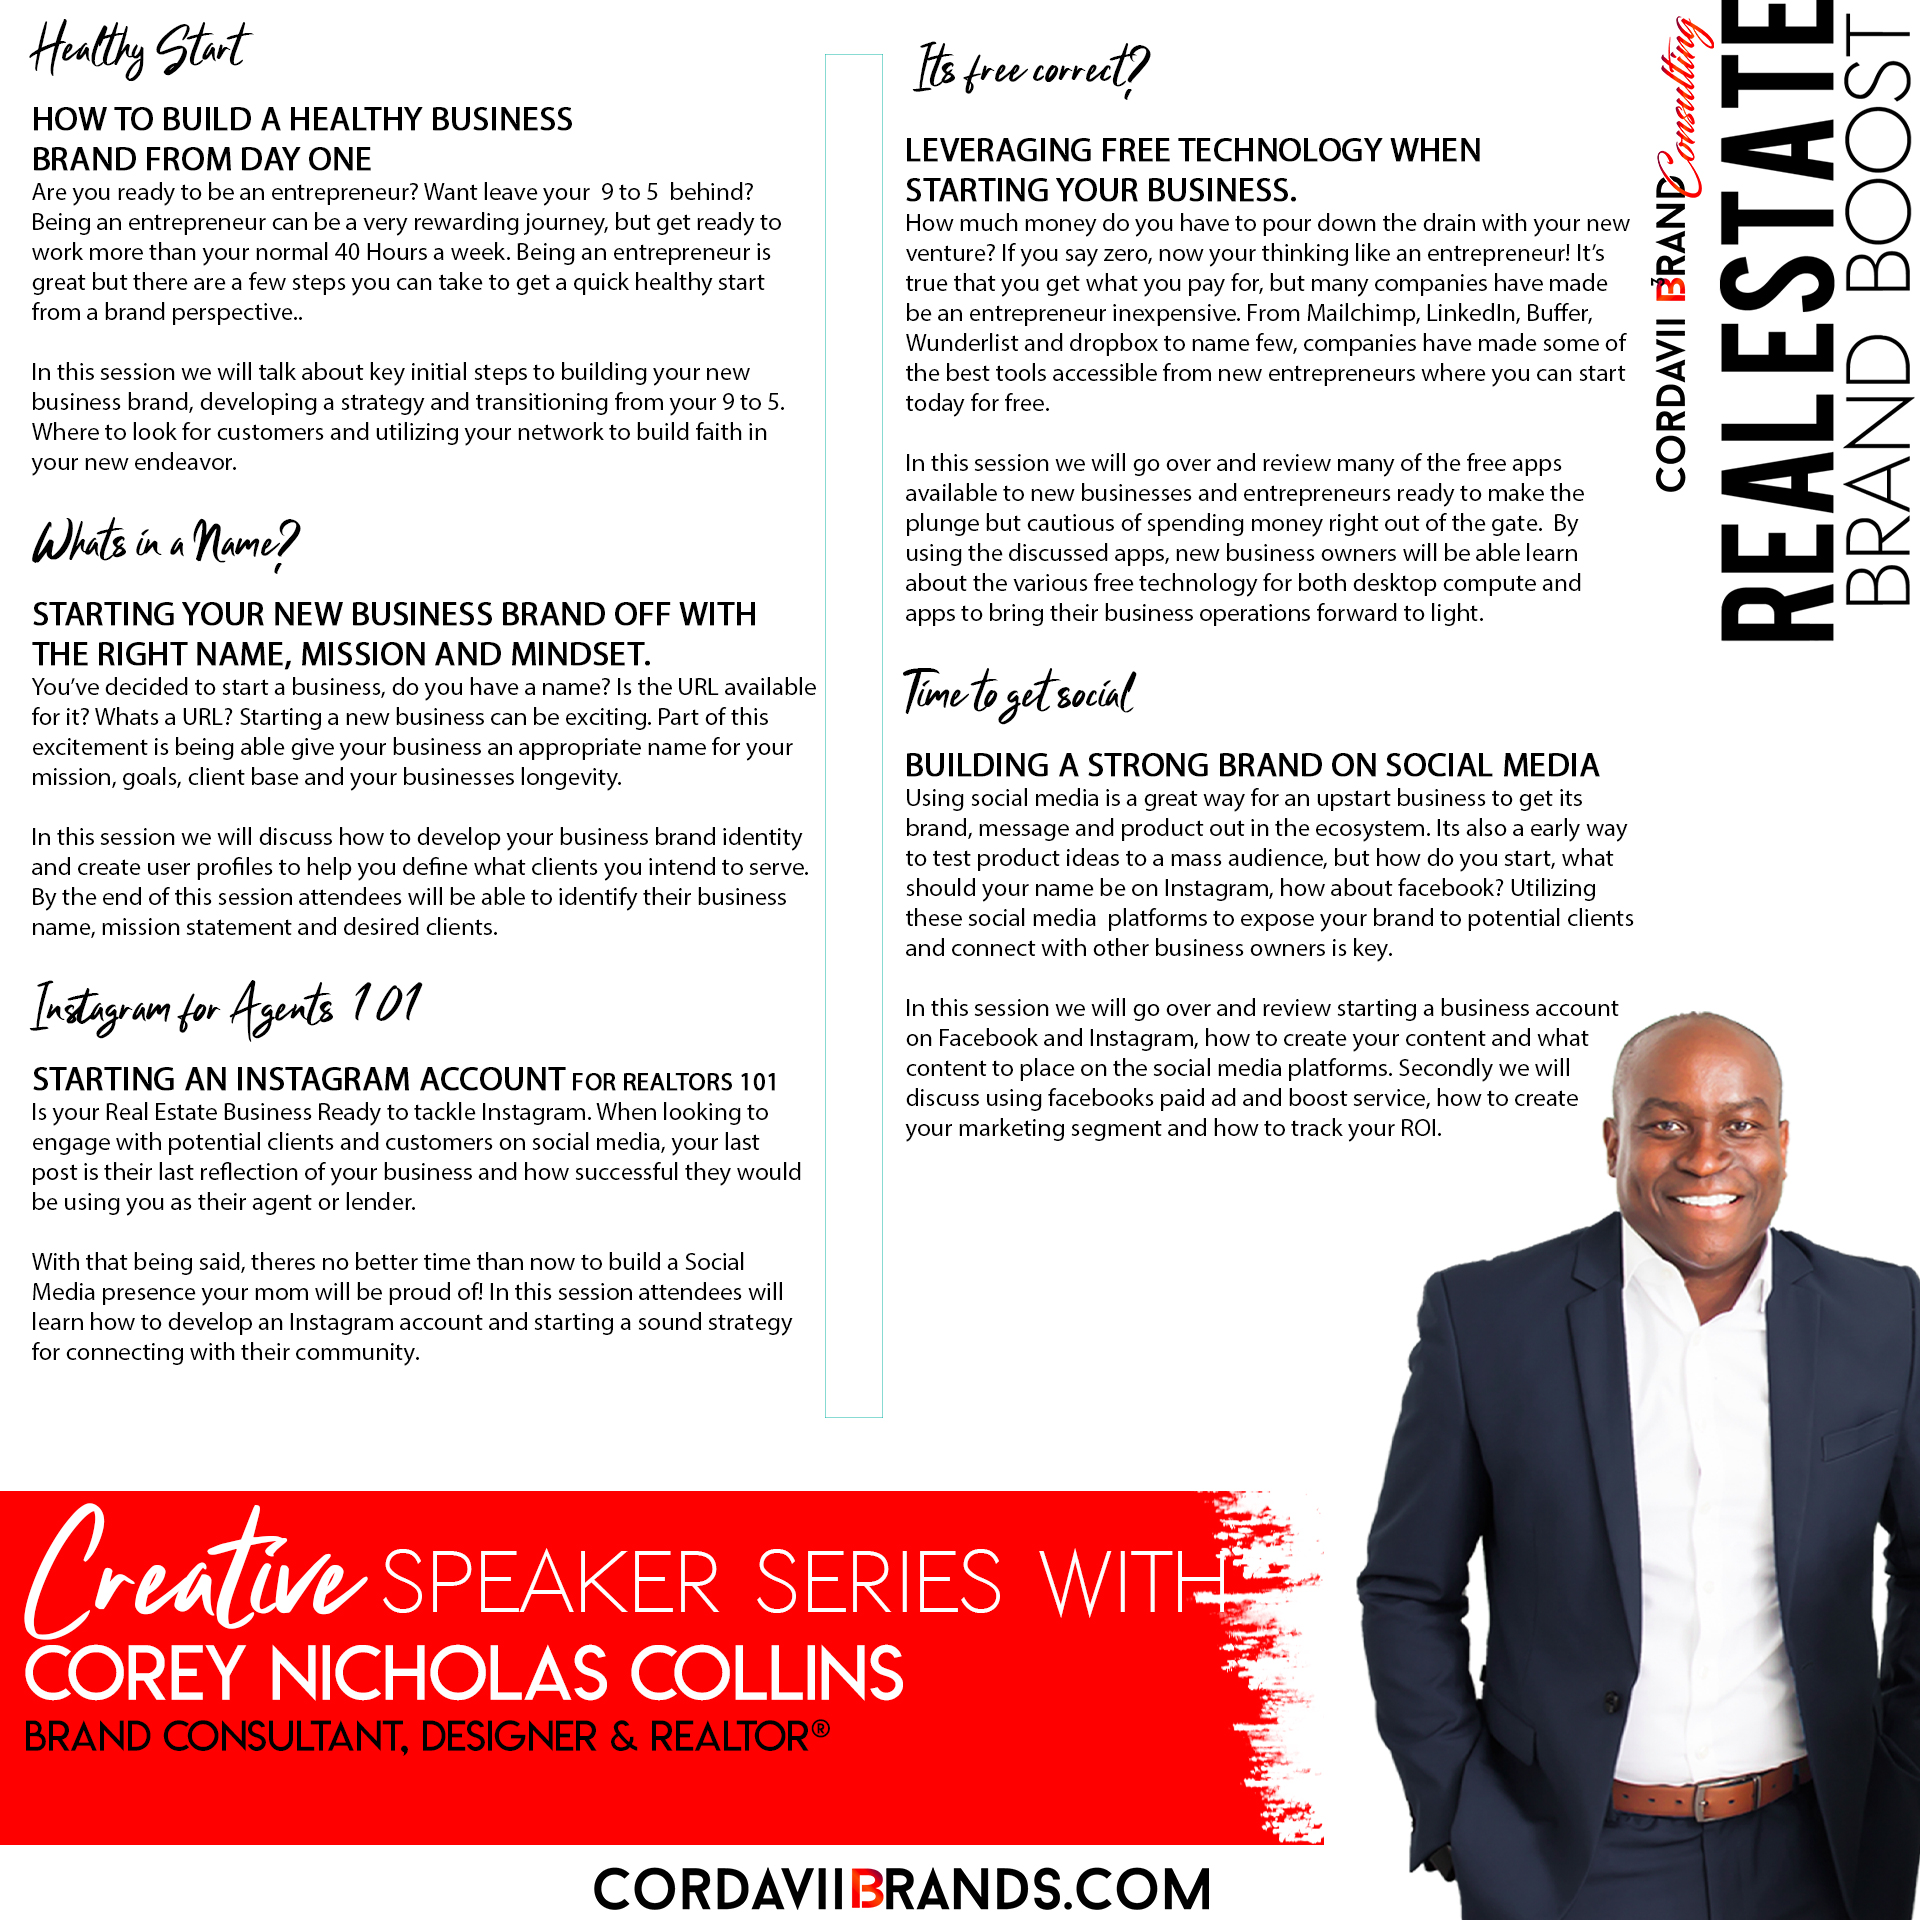 Corey Collins Speaker Series